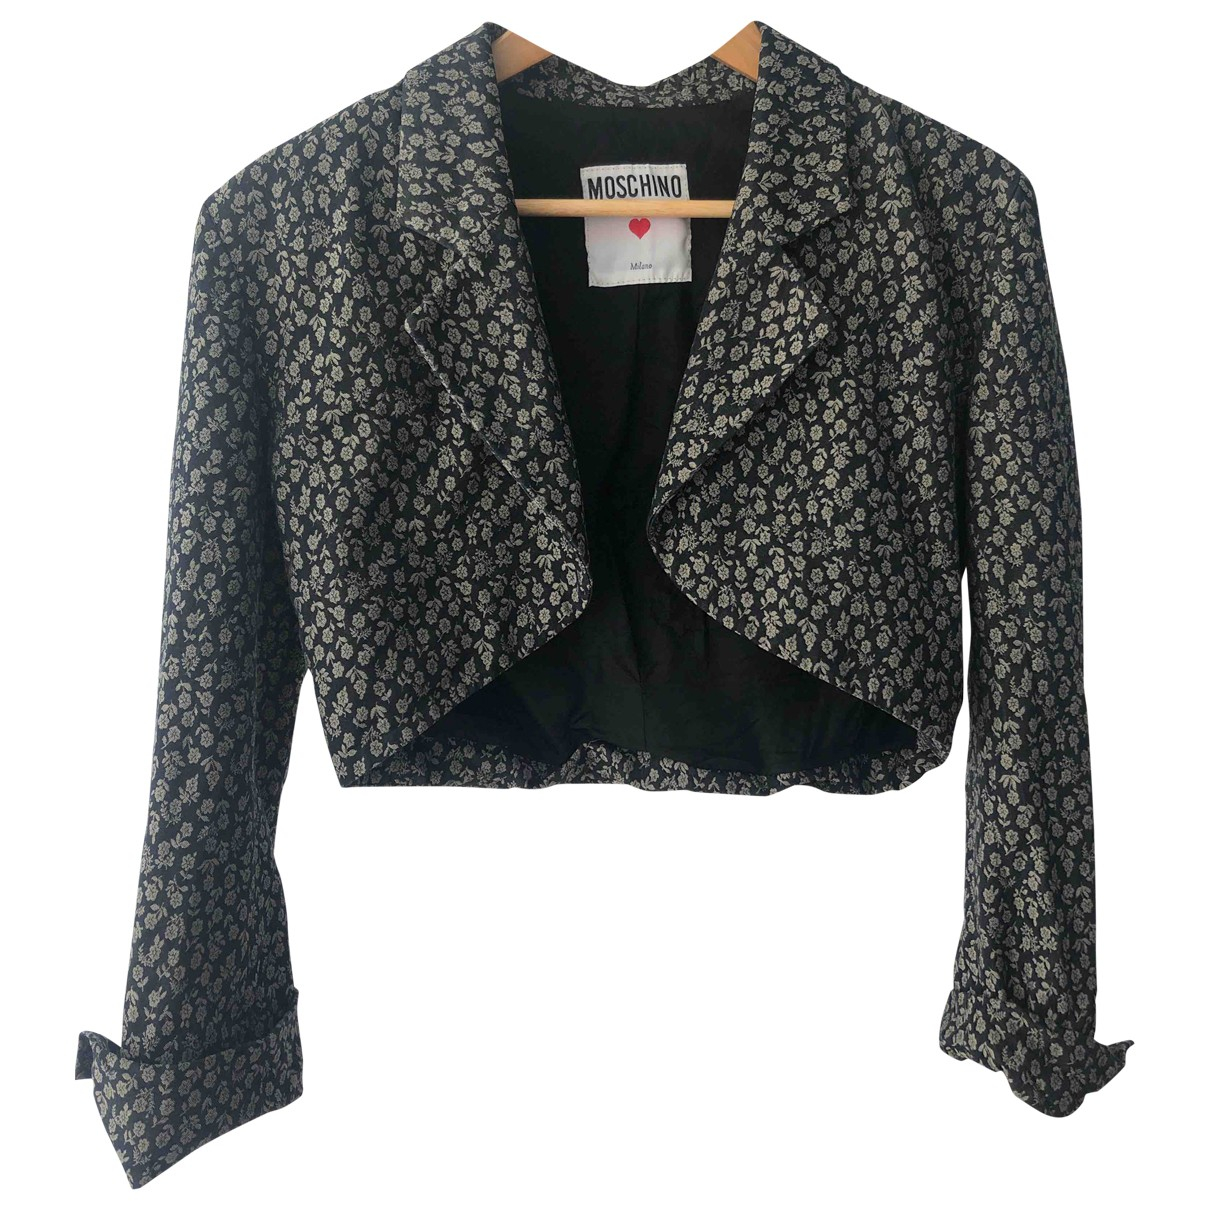 Moschino - Veste   pour femme en coton - noir